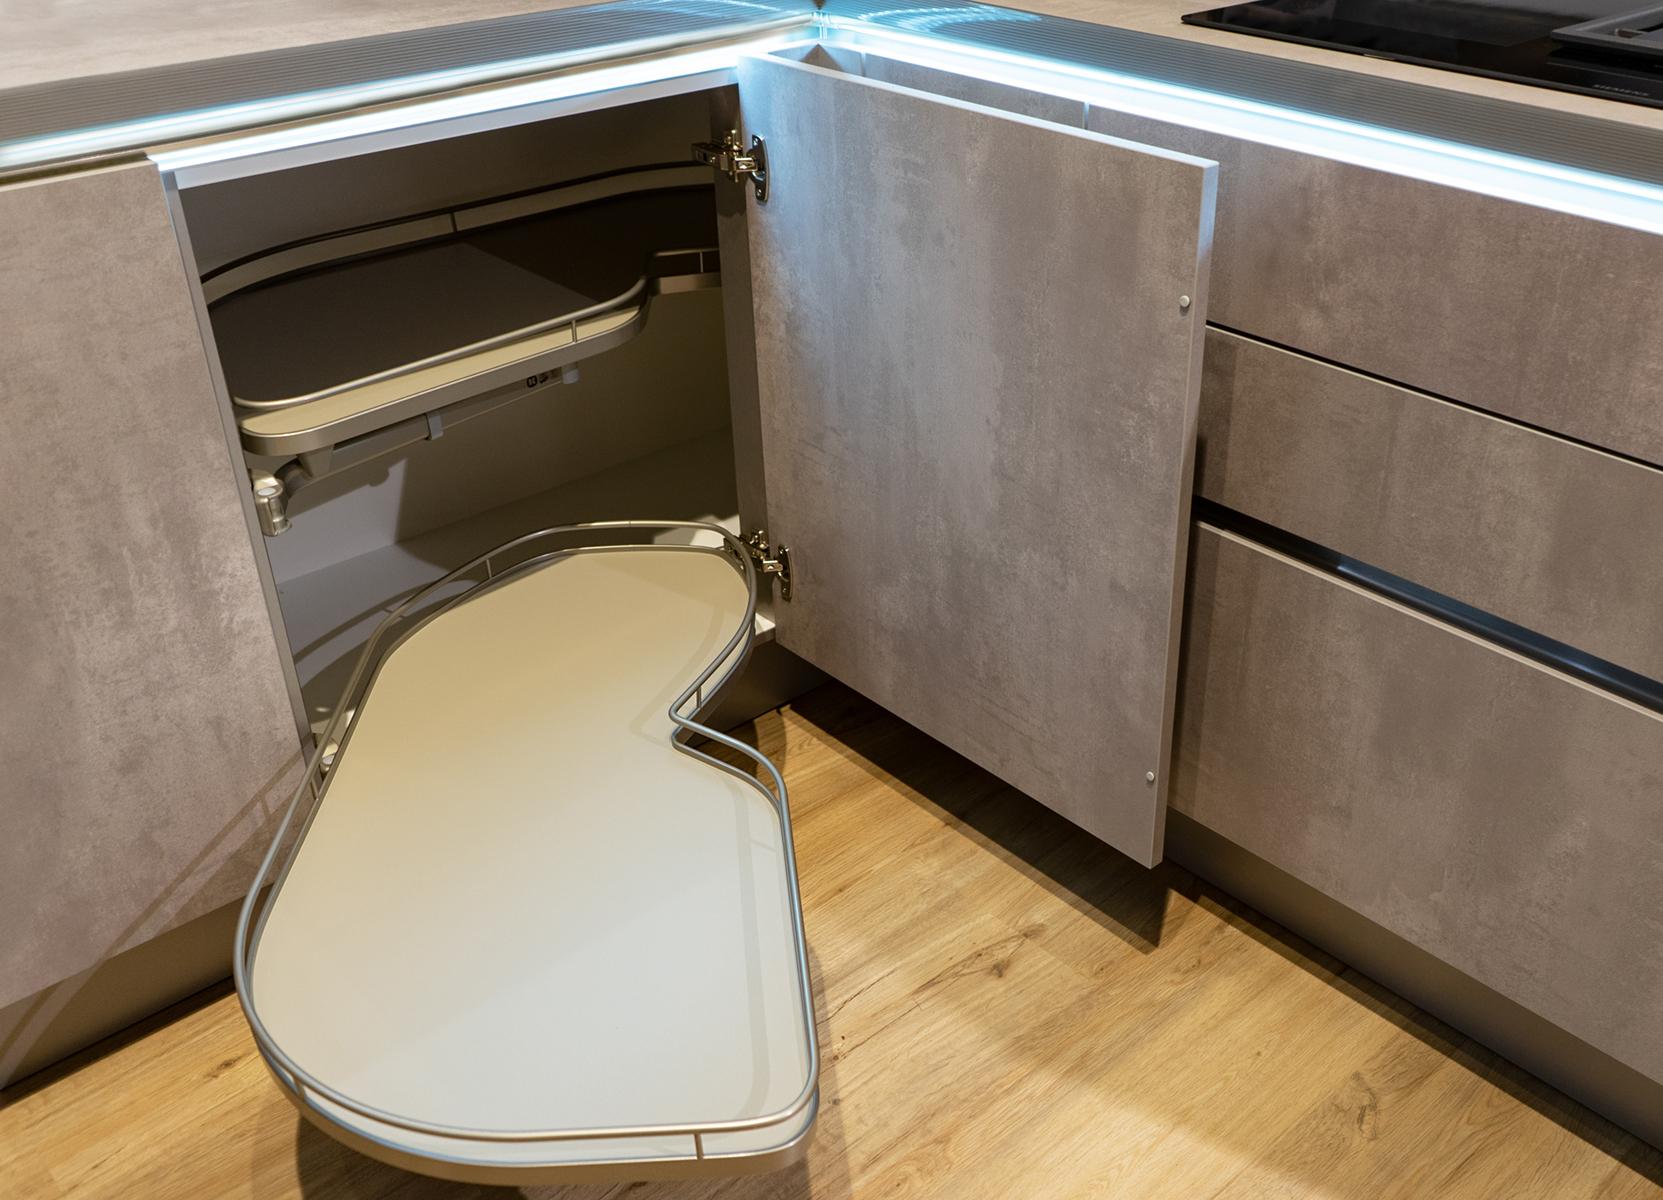 Full Size of Drehboden Eckschrank Küche Eckschrank Küche Weiß Hochglanz Ikea Eckschrank Küche Oben Korpus Eckschrank Küche Küche Eckschrank Küche